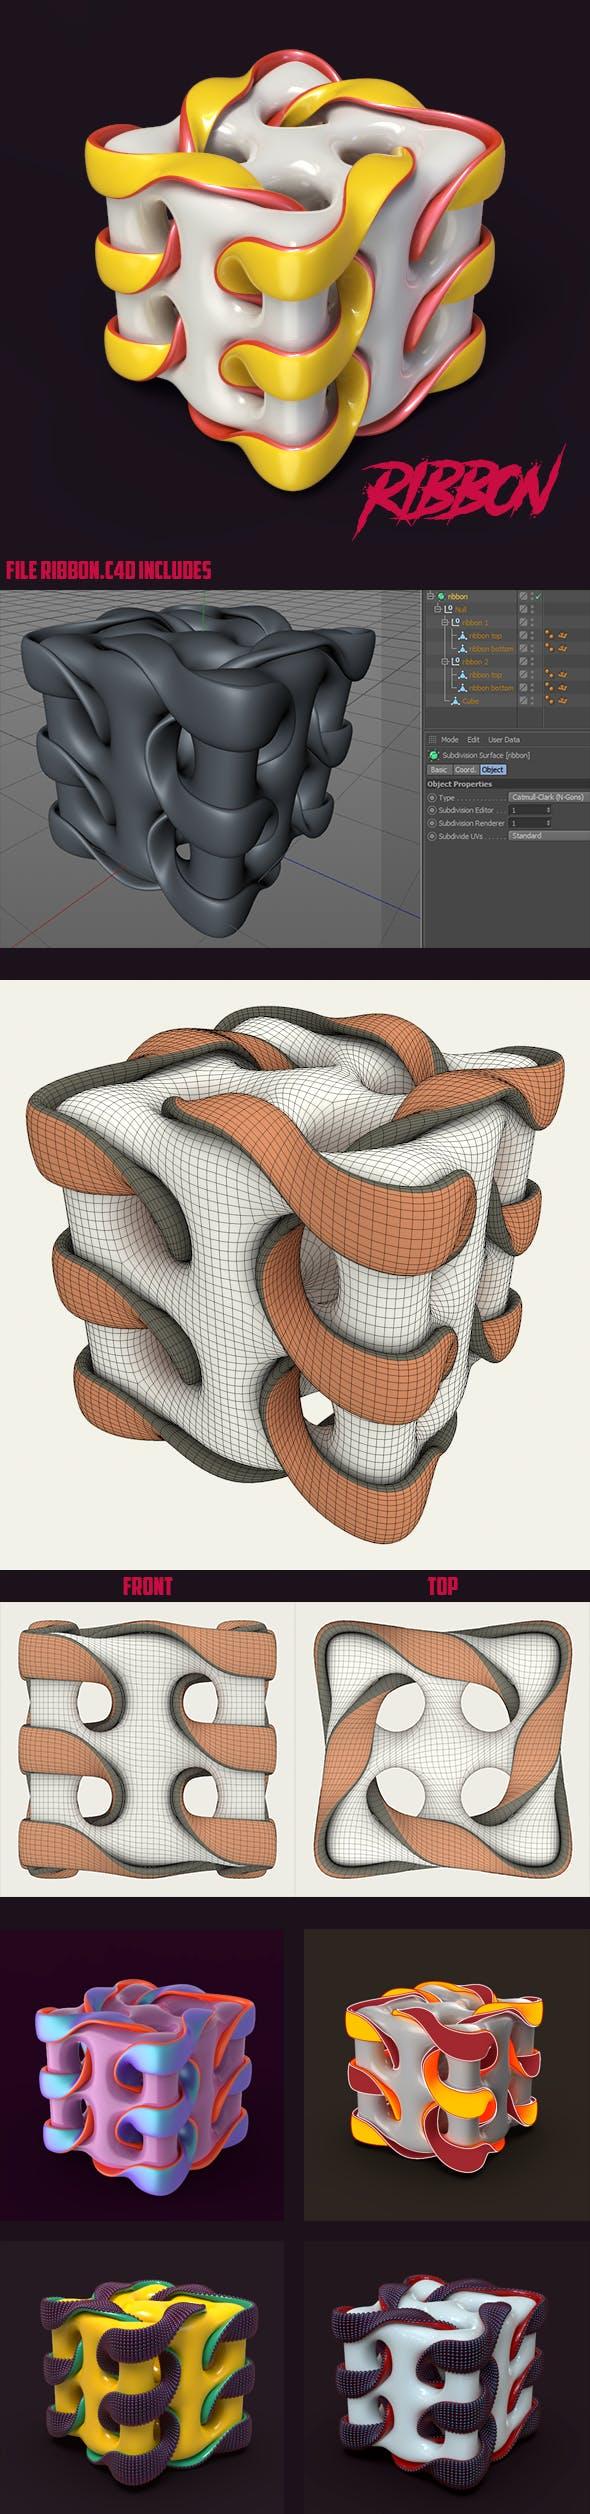 ribbon - 3DOcean Item for Sale